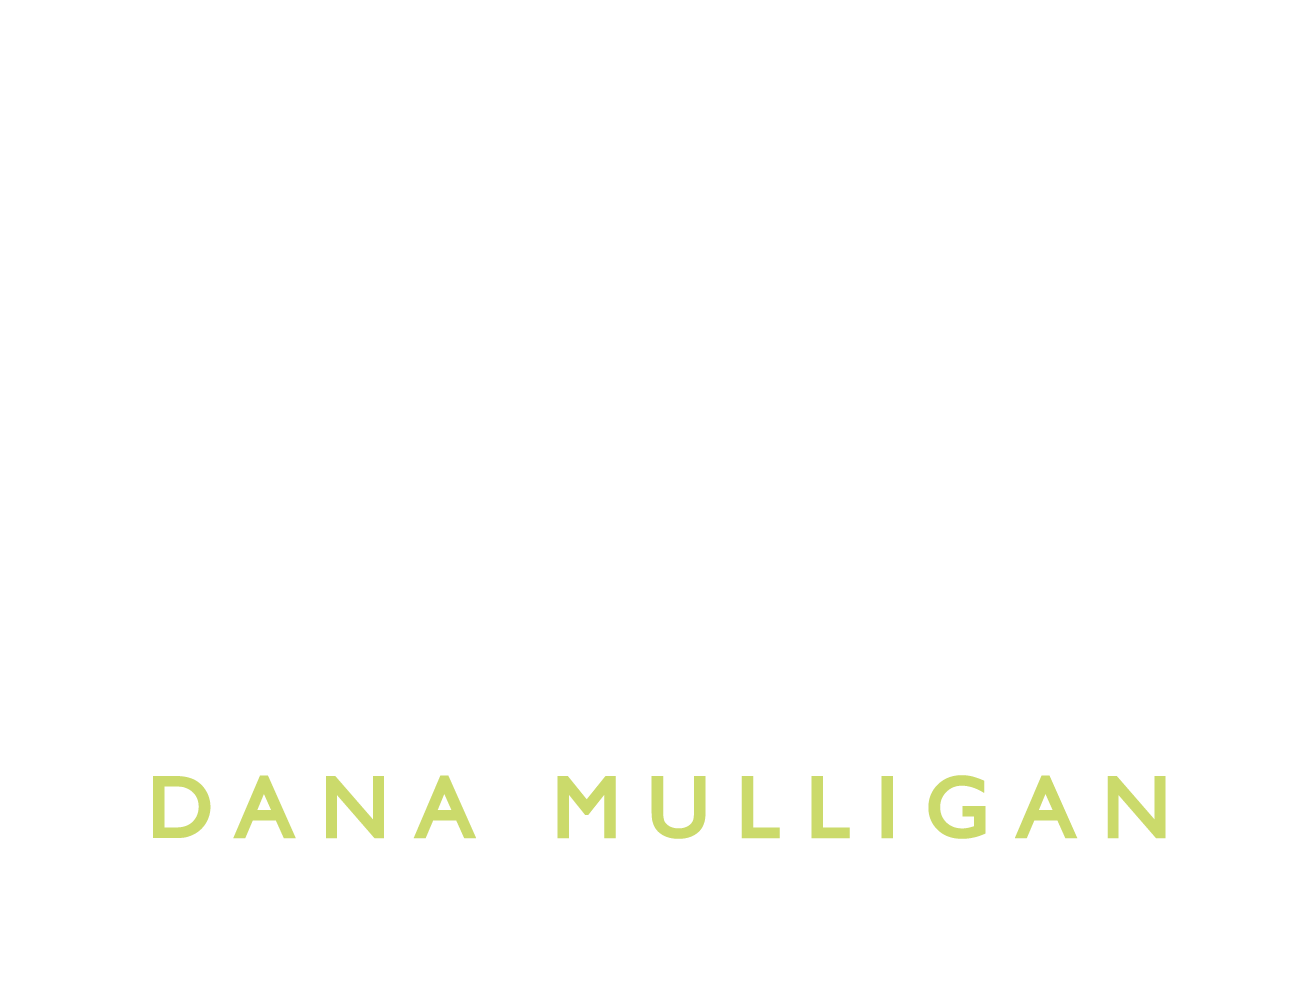 Dana Mulligan